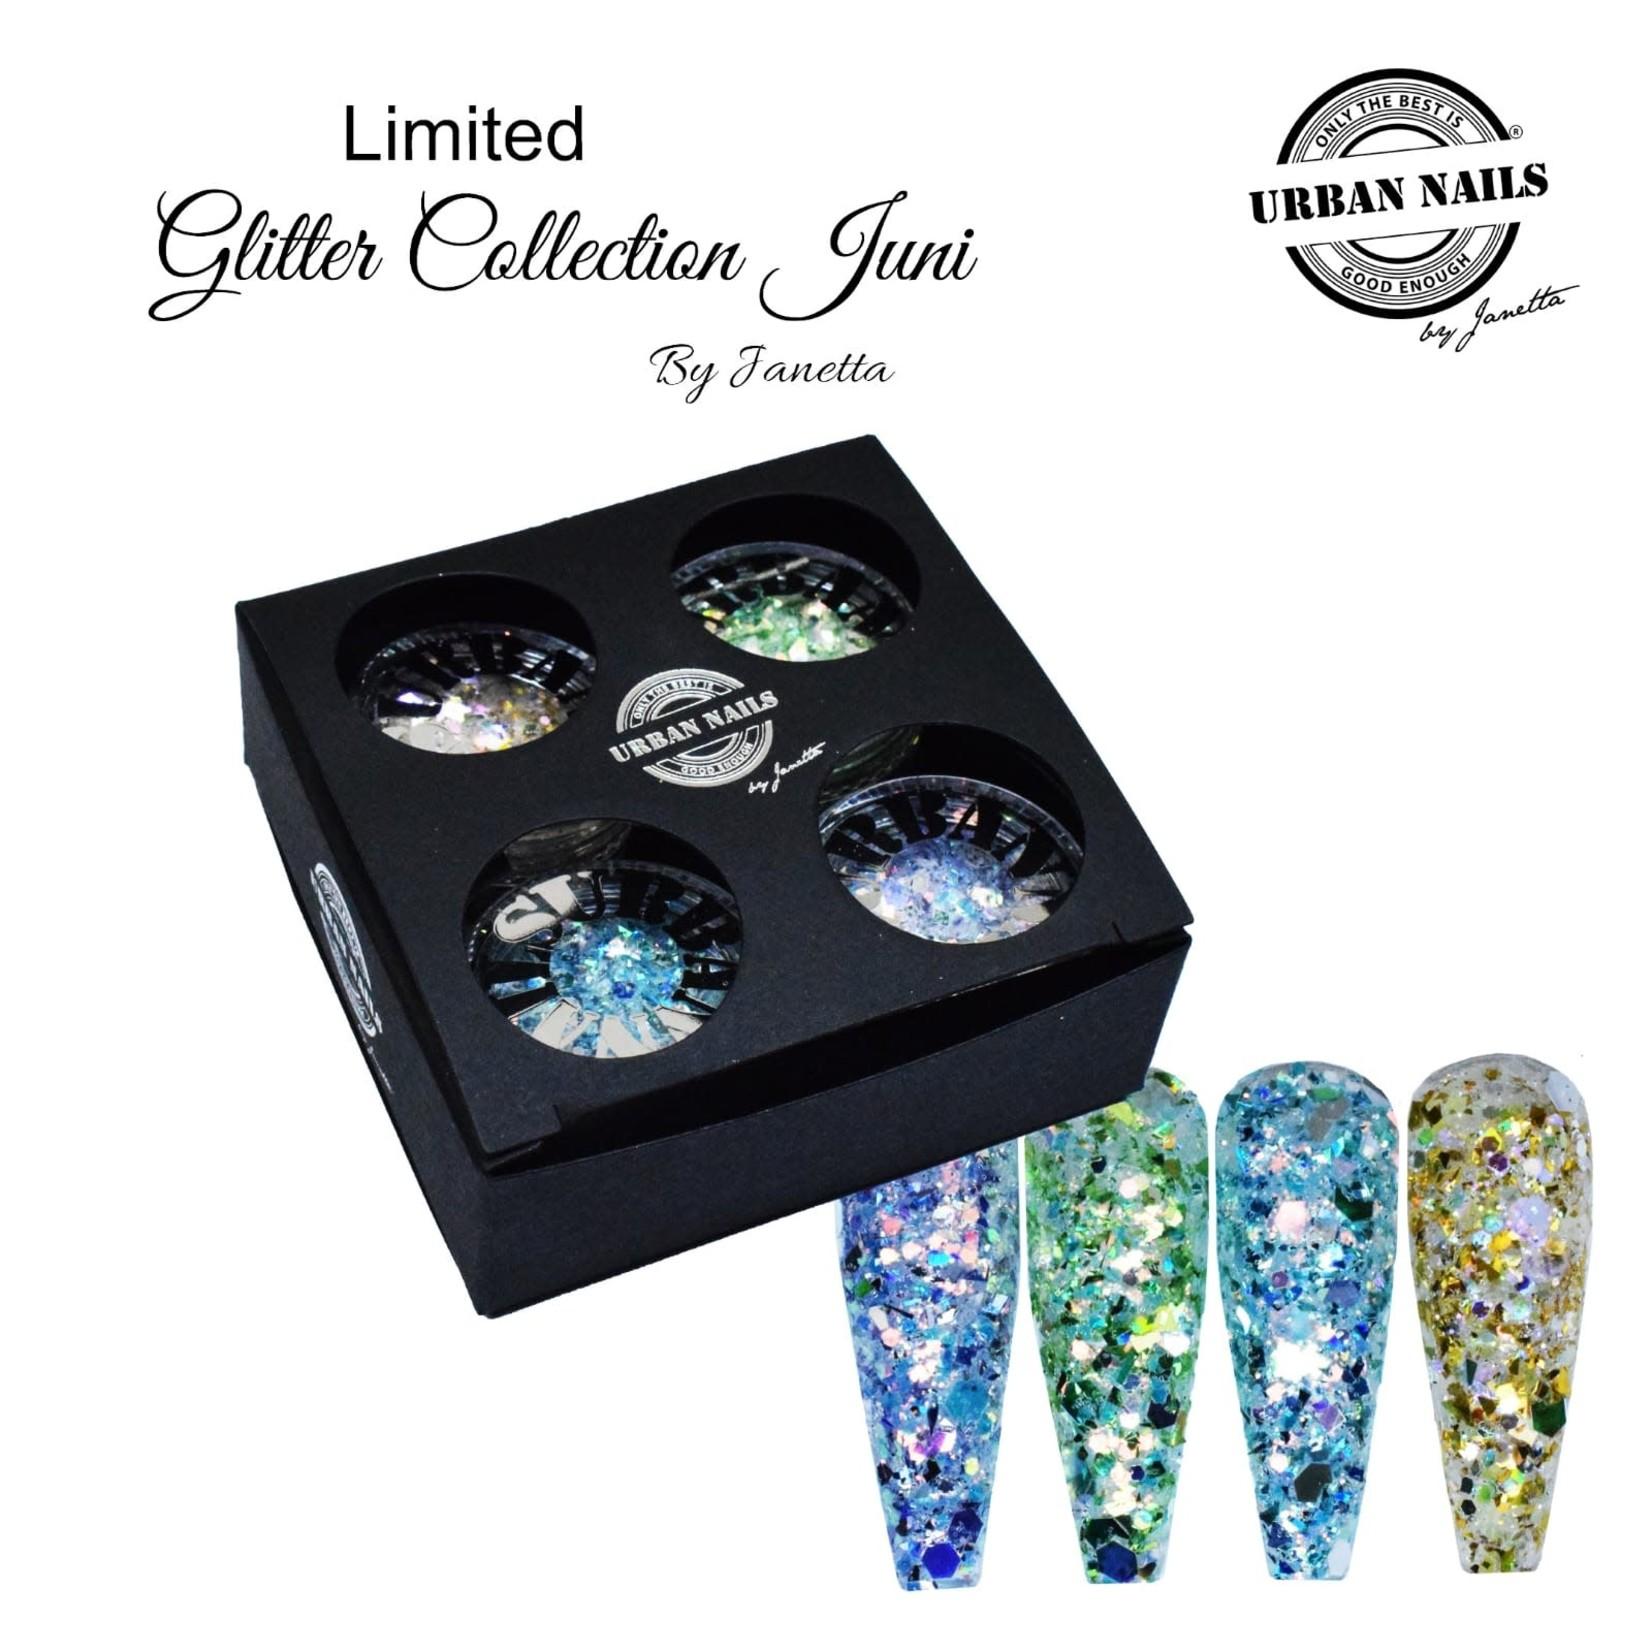 Urban Nails Glitter Collection Juni